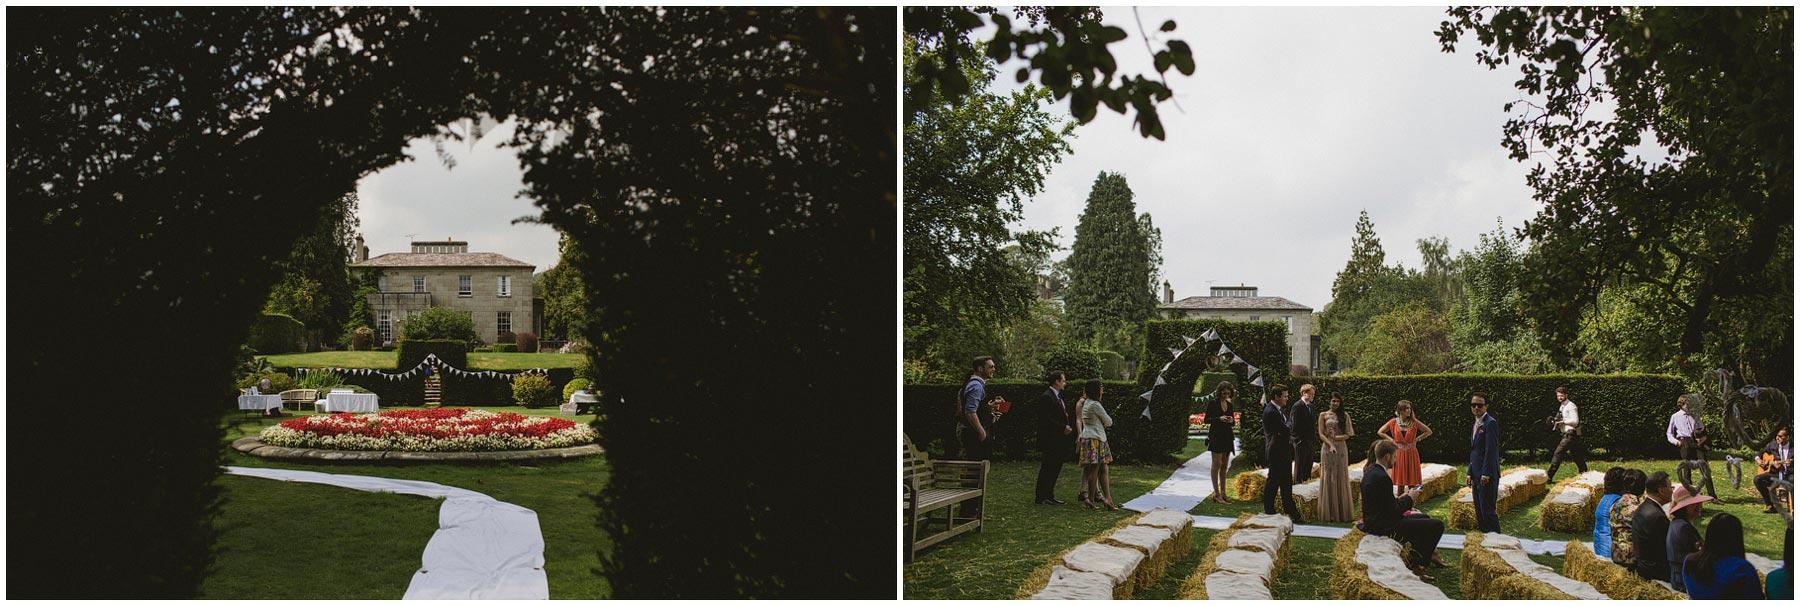 Colehayes-Park-Wedding-Photography_0051